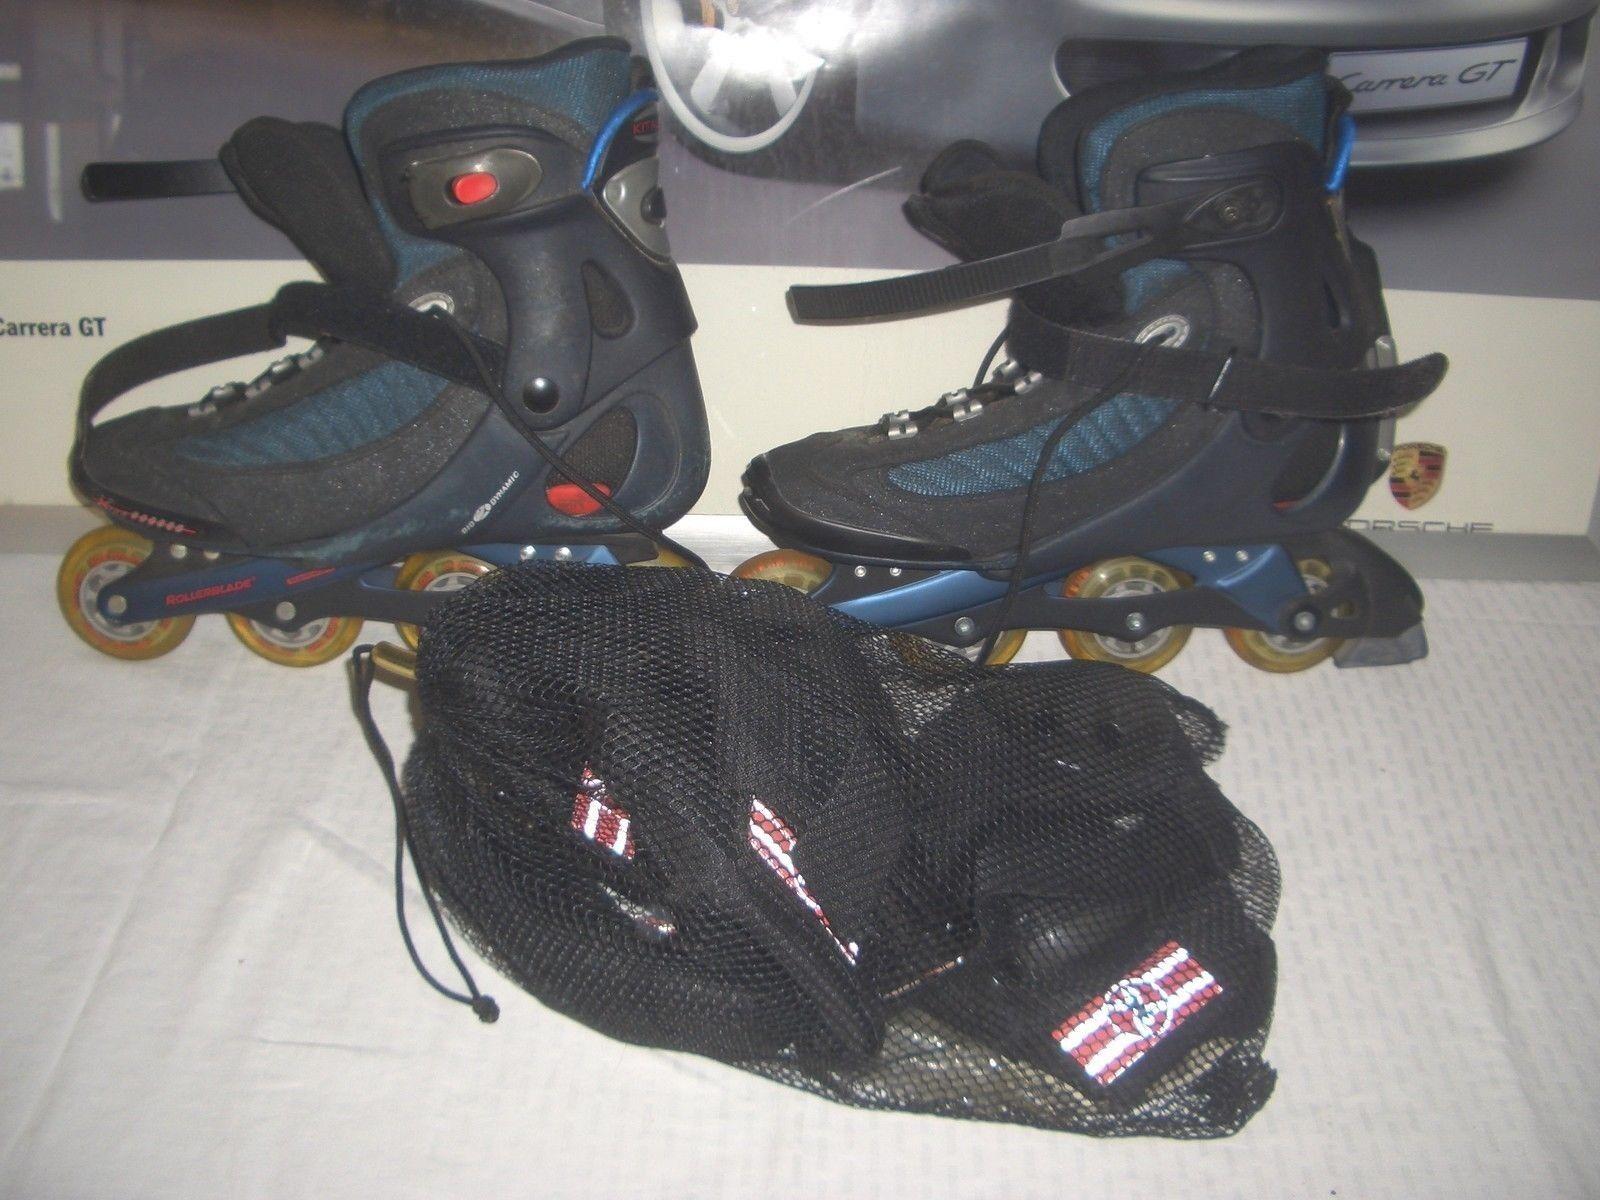 Rollerblade 44.5 Kitalpha beta Gr. 44.5 Rollerblade US 11 Made  gebraucht 067603